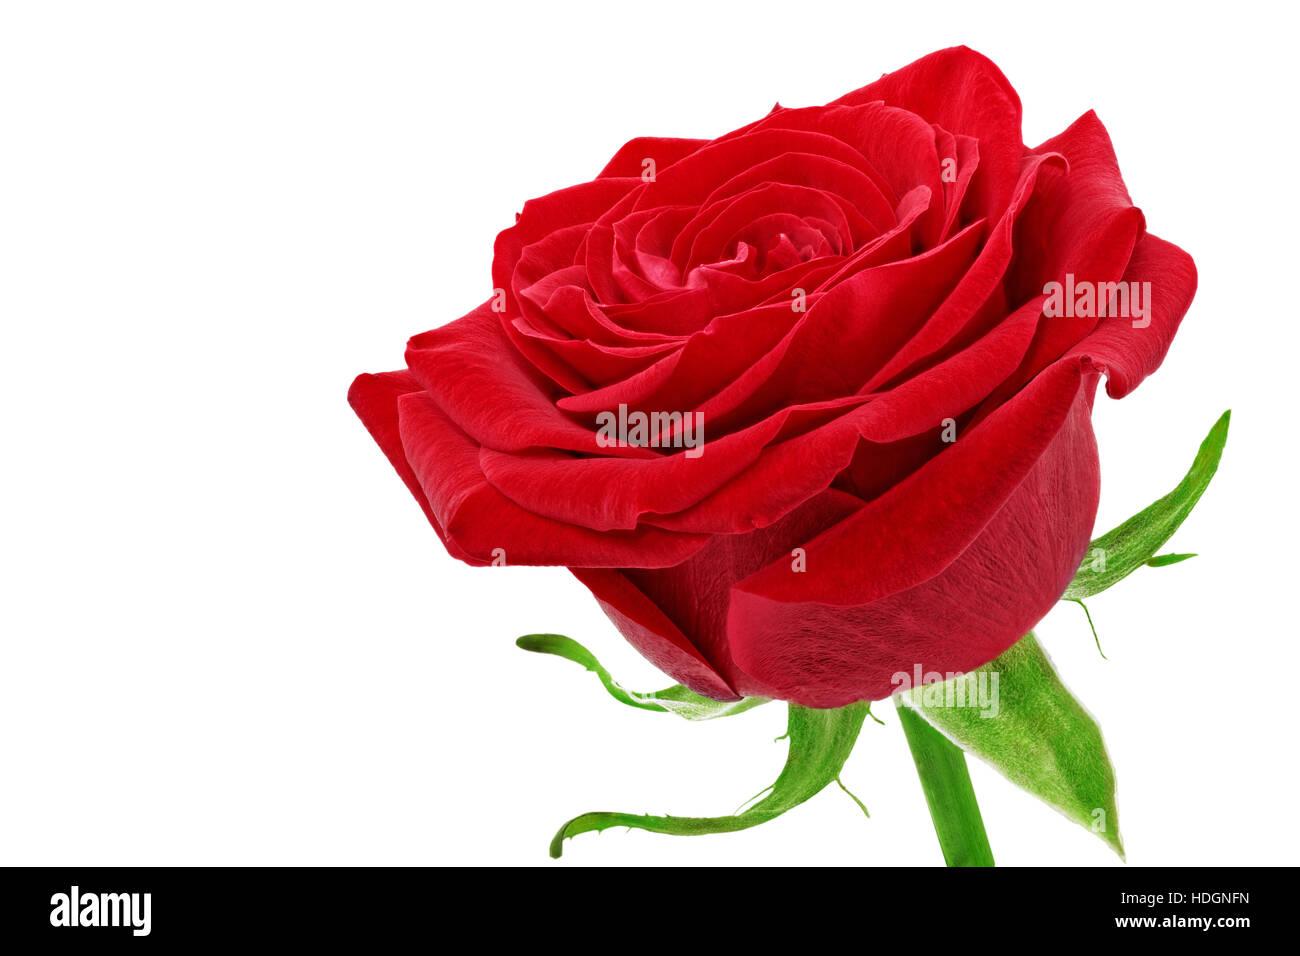 Pics of beautiful single red rose daily health beautiful single red rose flower isolated stock photo 128831241 izmirmasajfo